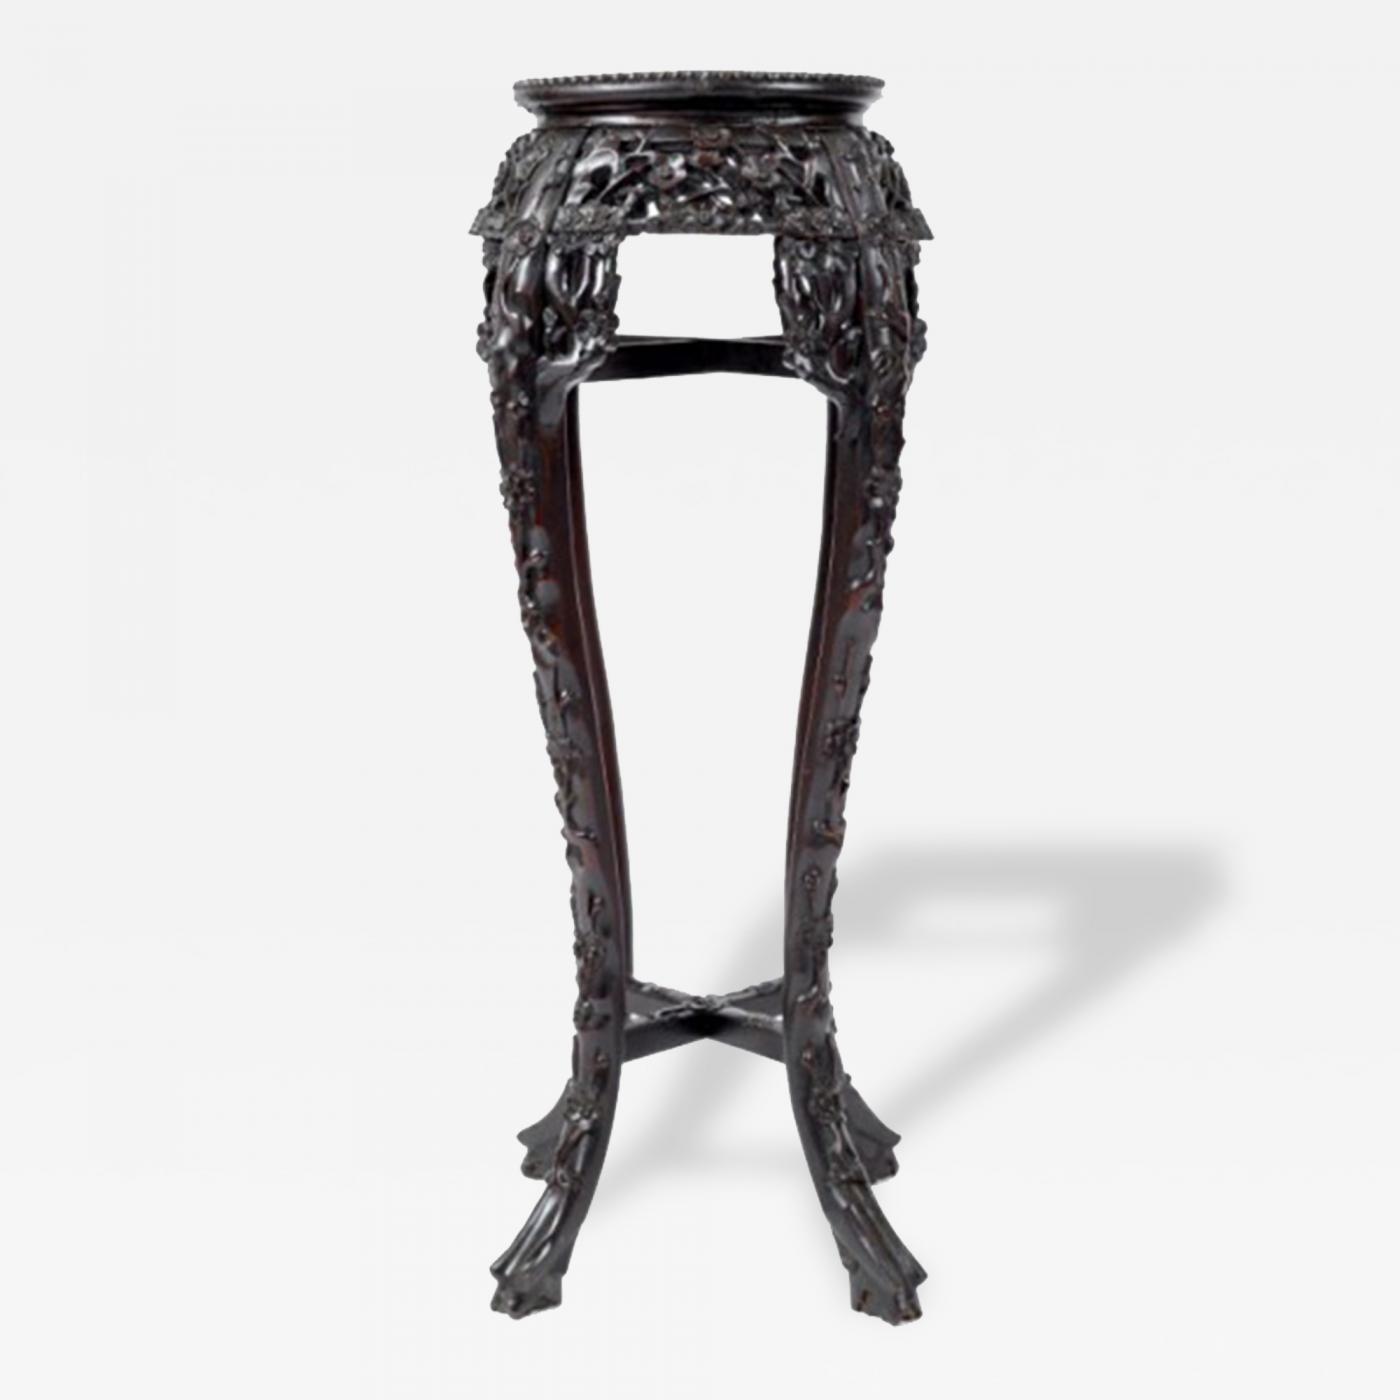 athena outdoor dp products pedestal corinthian the toscano decor design stands amazon com garden home